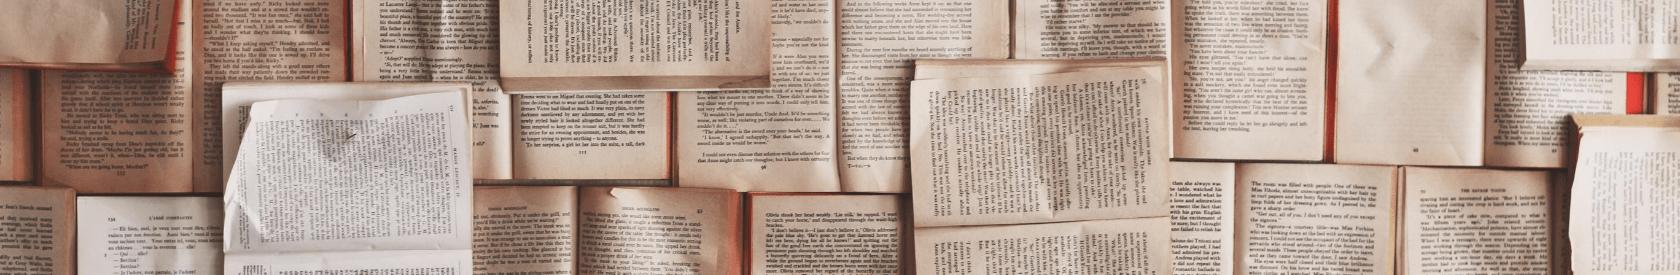 J-Book Club: The Reason I Jump, Naoki Higashida